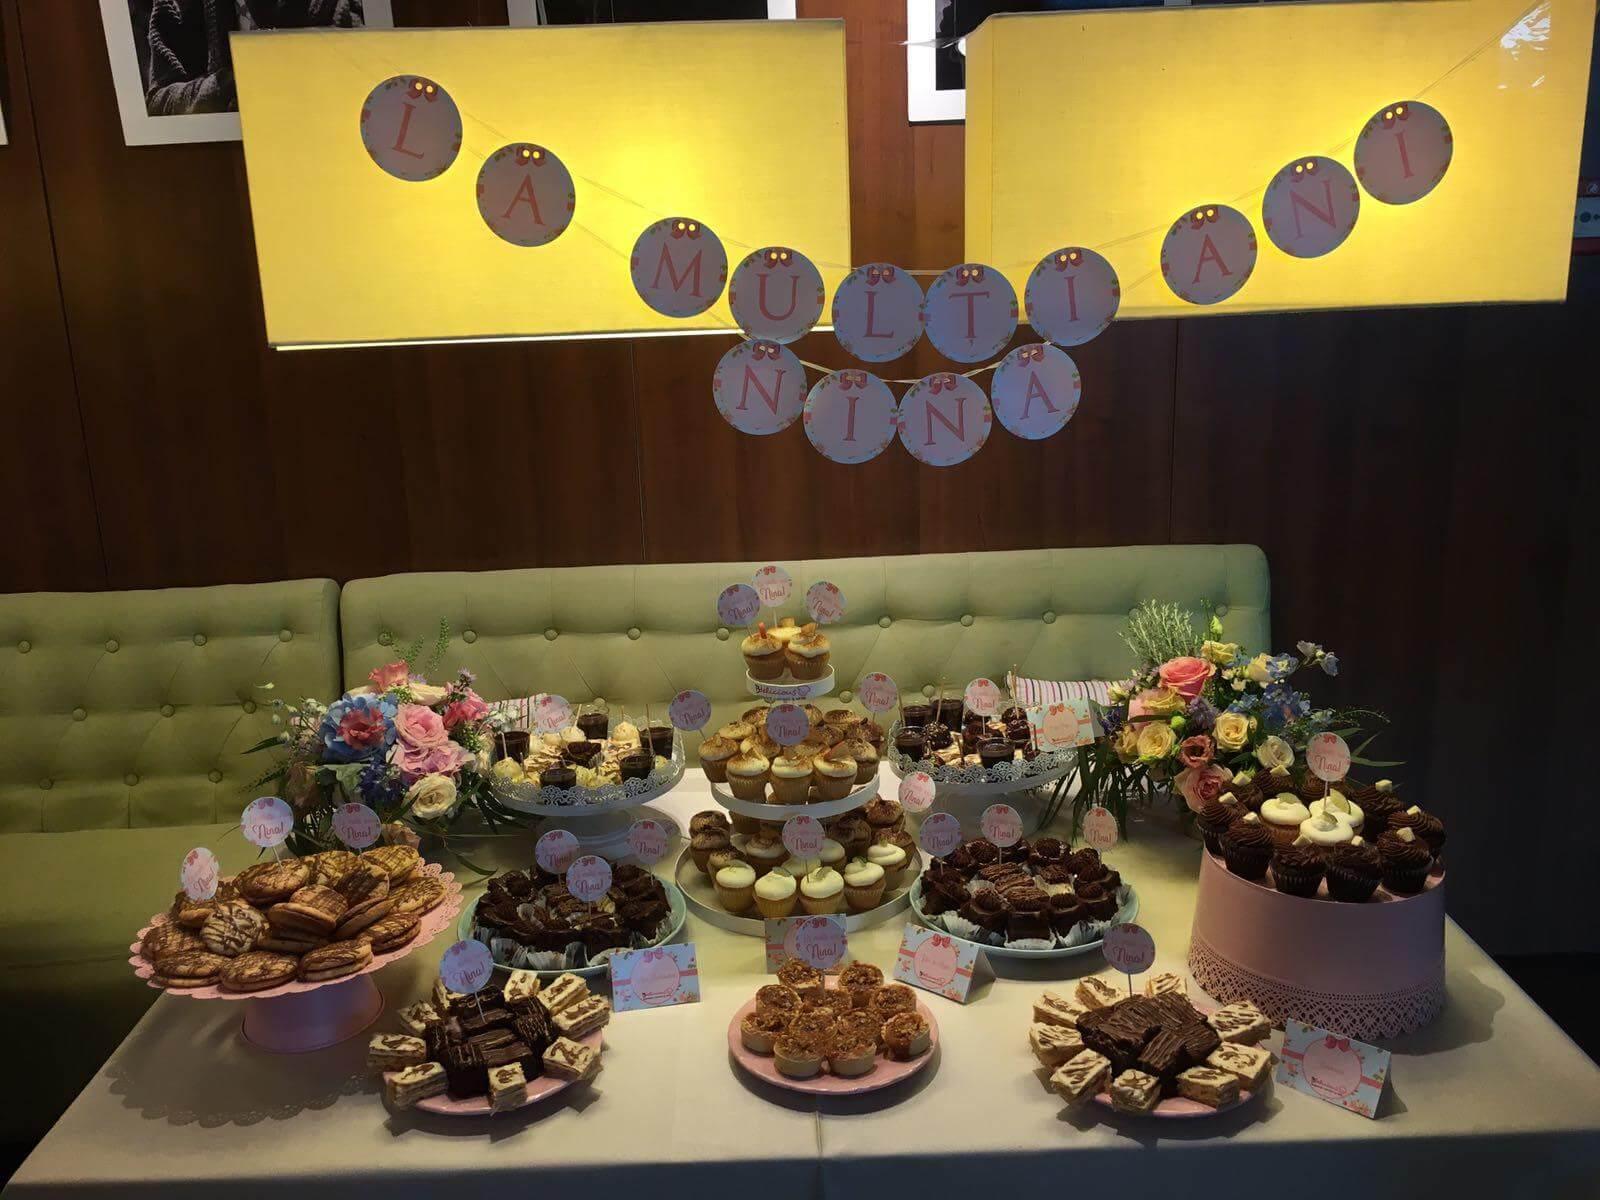 candy bar botez tort nuntă brioșe și prăjituri bdelicious brașov